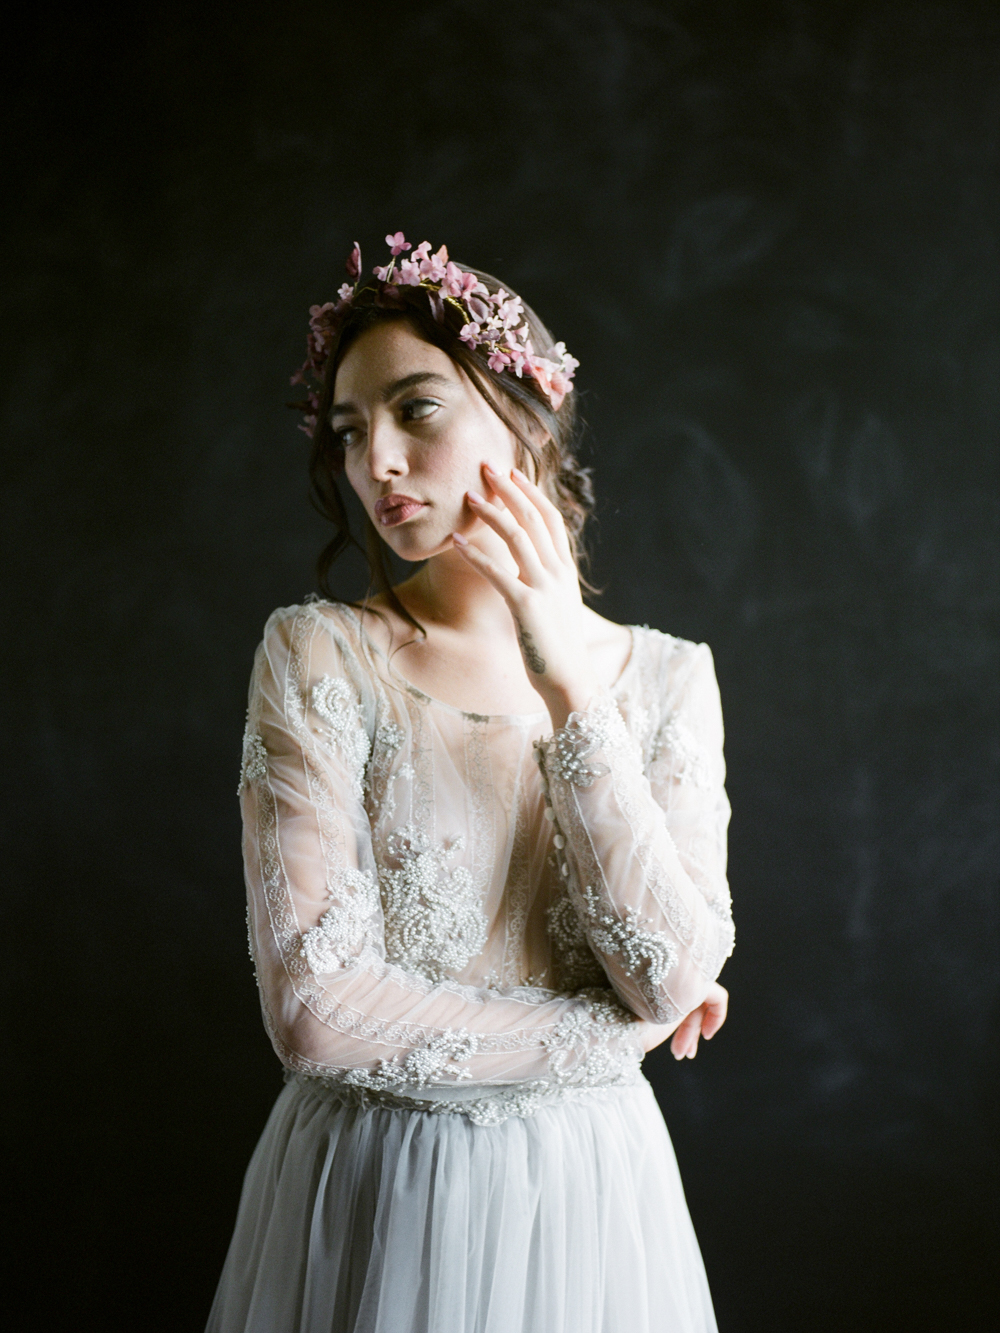 Christine Gosch - Erin Rhyne - film photographer - brand photographer - portrait photographer-5.jpg